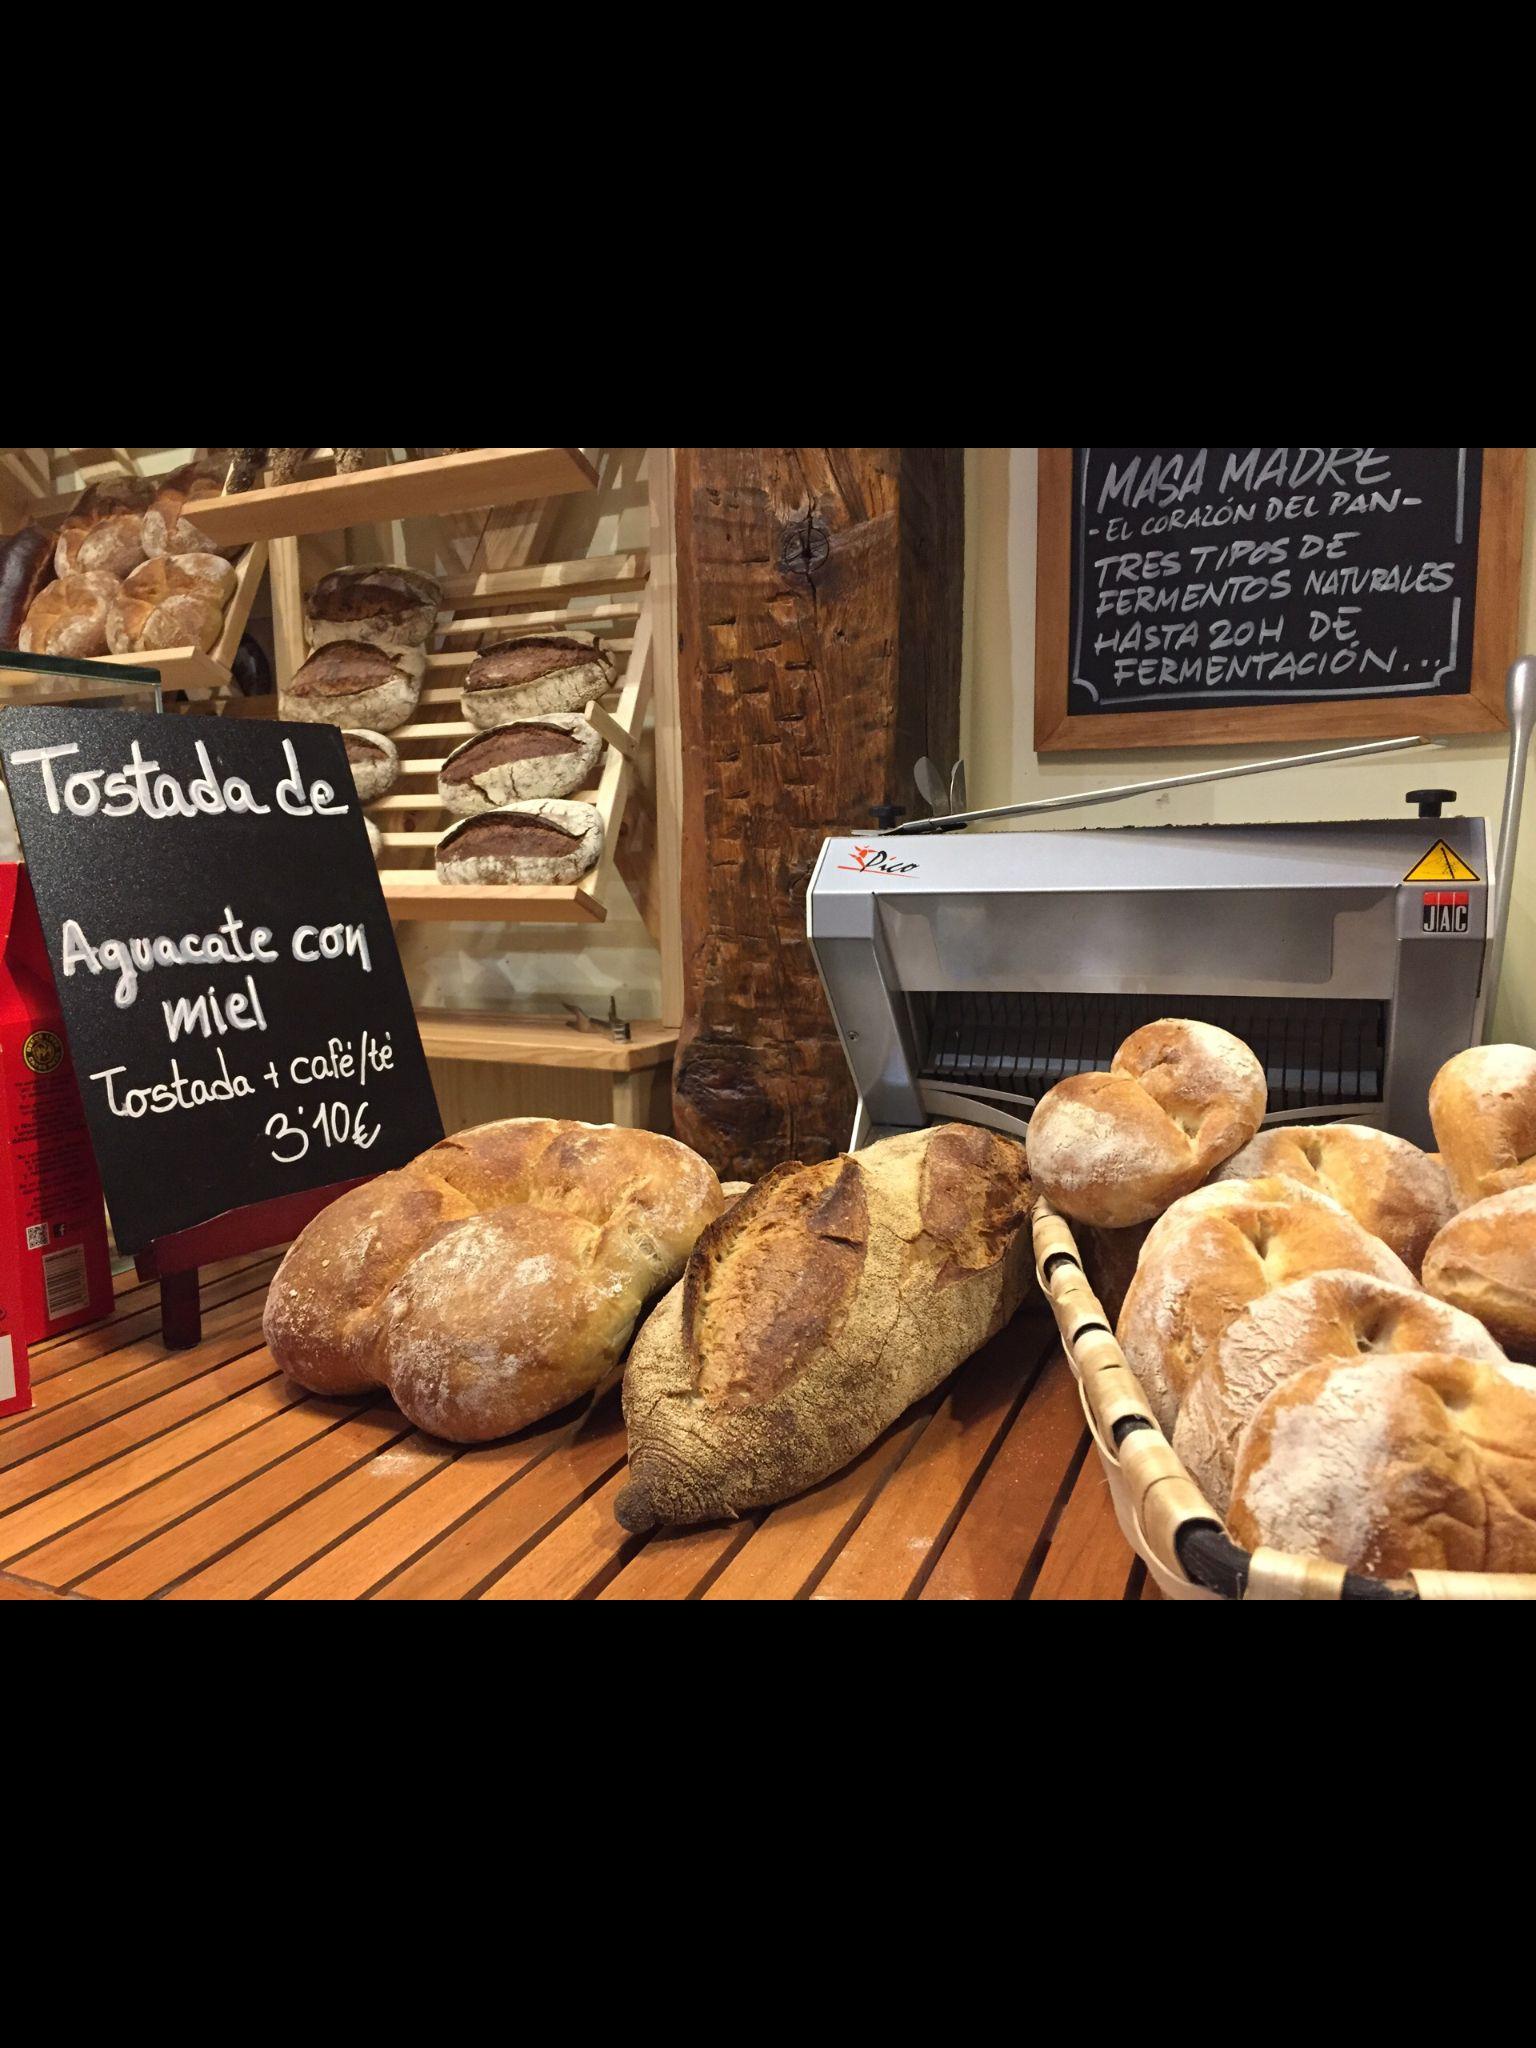 Pan de almazara, pan de autor, francesilla